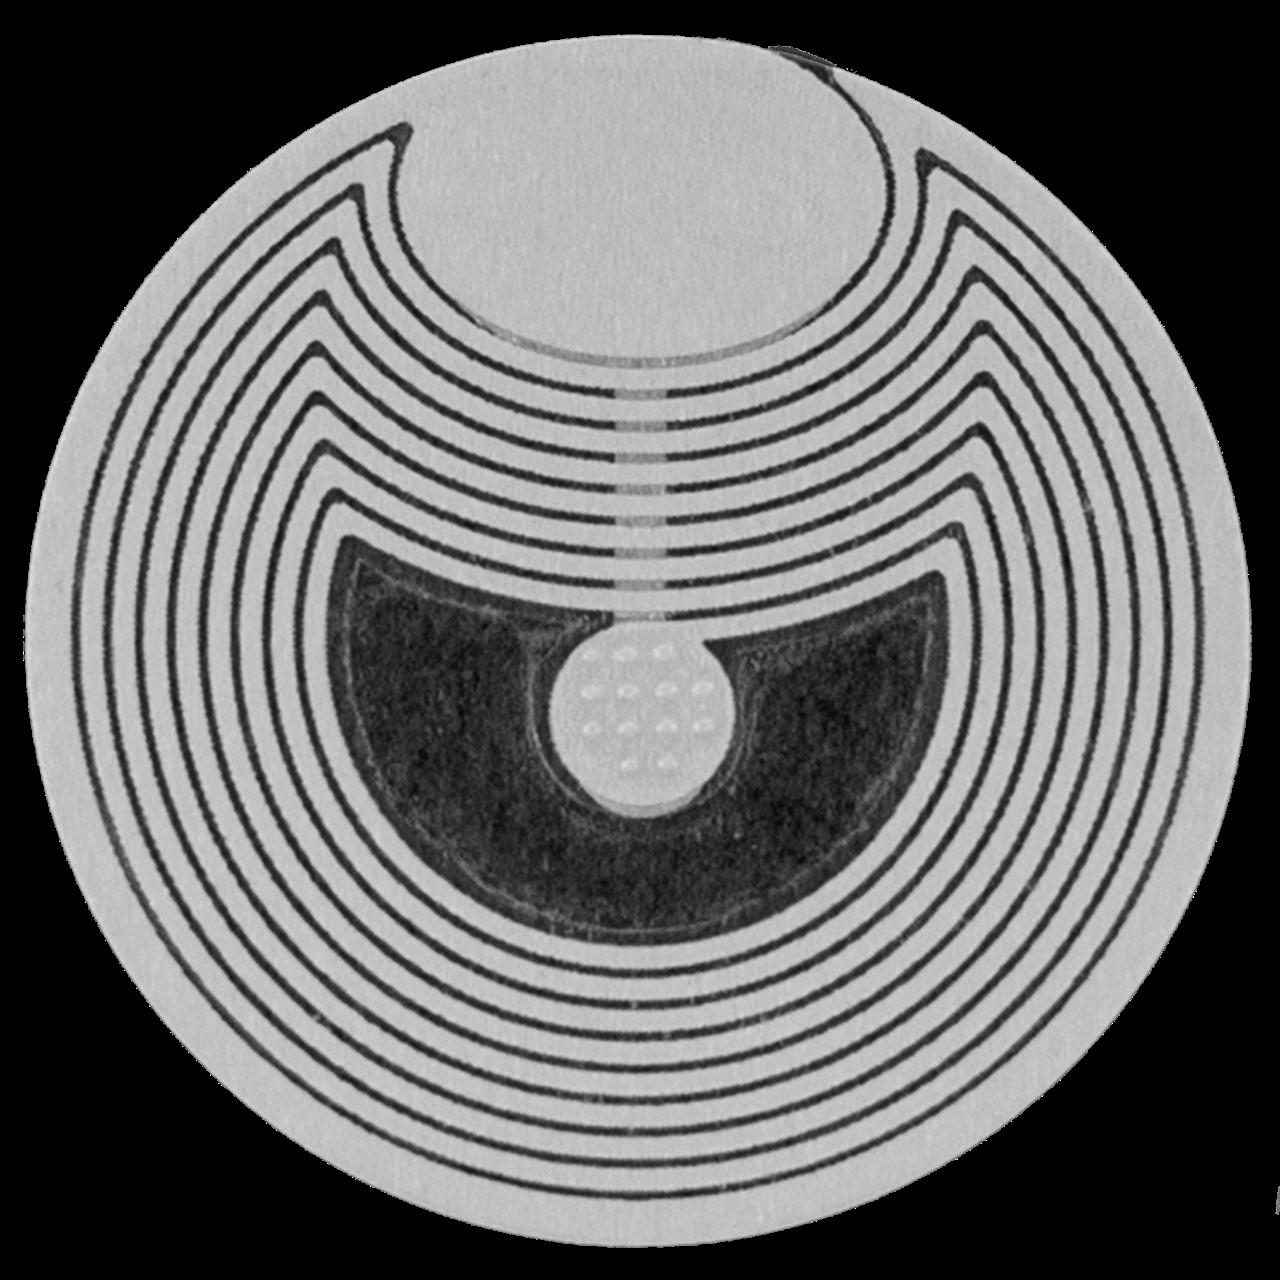 Sensormatic RF 33mm Round Roll Label in Armenia at Vantag LLC